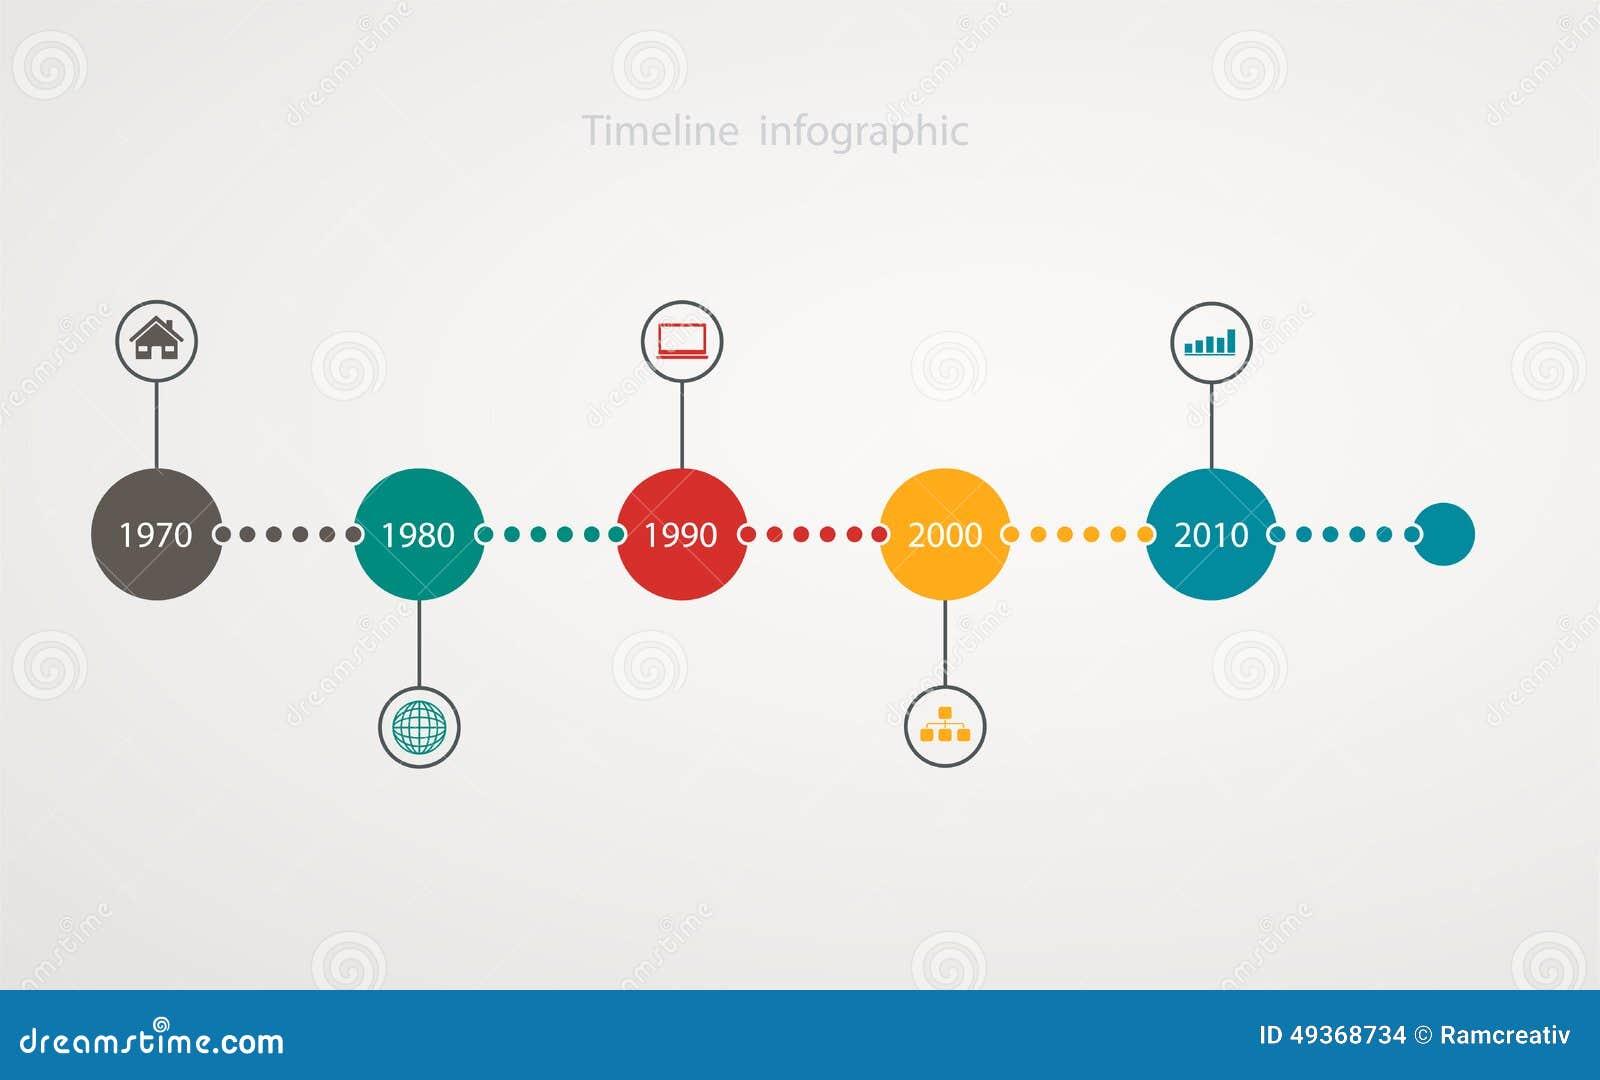 atomic model timeline project pdf